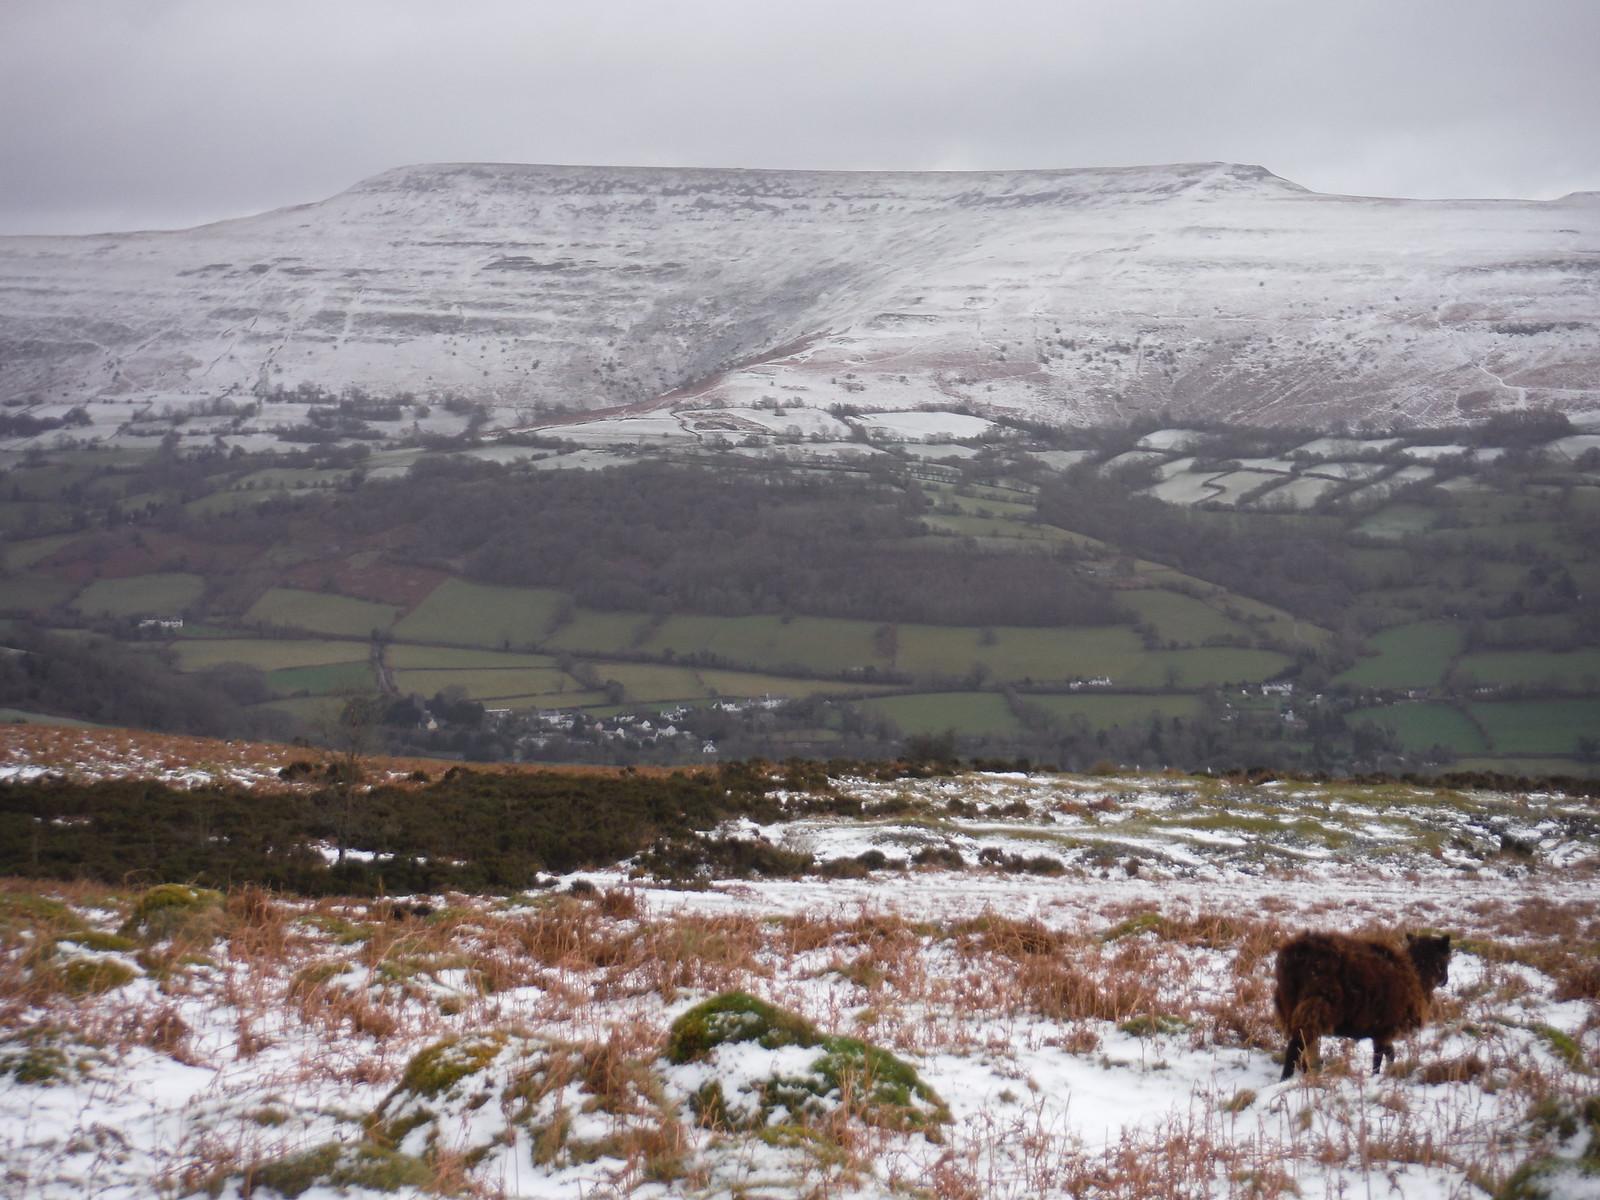 The Black Mountains across the Rhiangoll Valley: Pen Cerrig-calch to Pen Allt-mawr SWC Walk 308 - Bwlch Circular (via Mynydd Troed and Llangorse Lake)